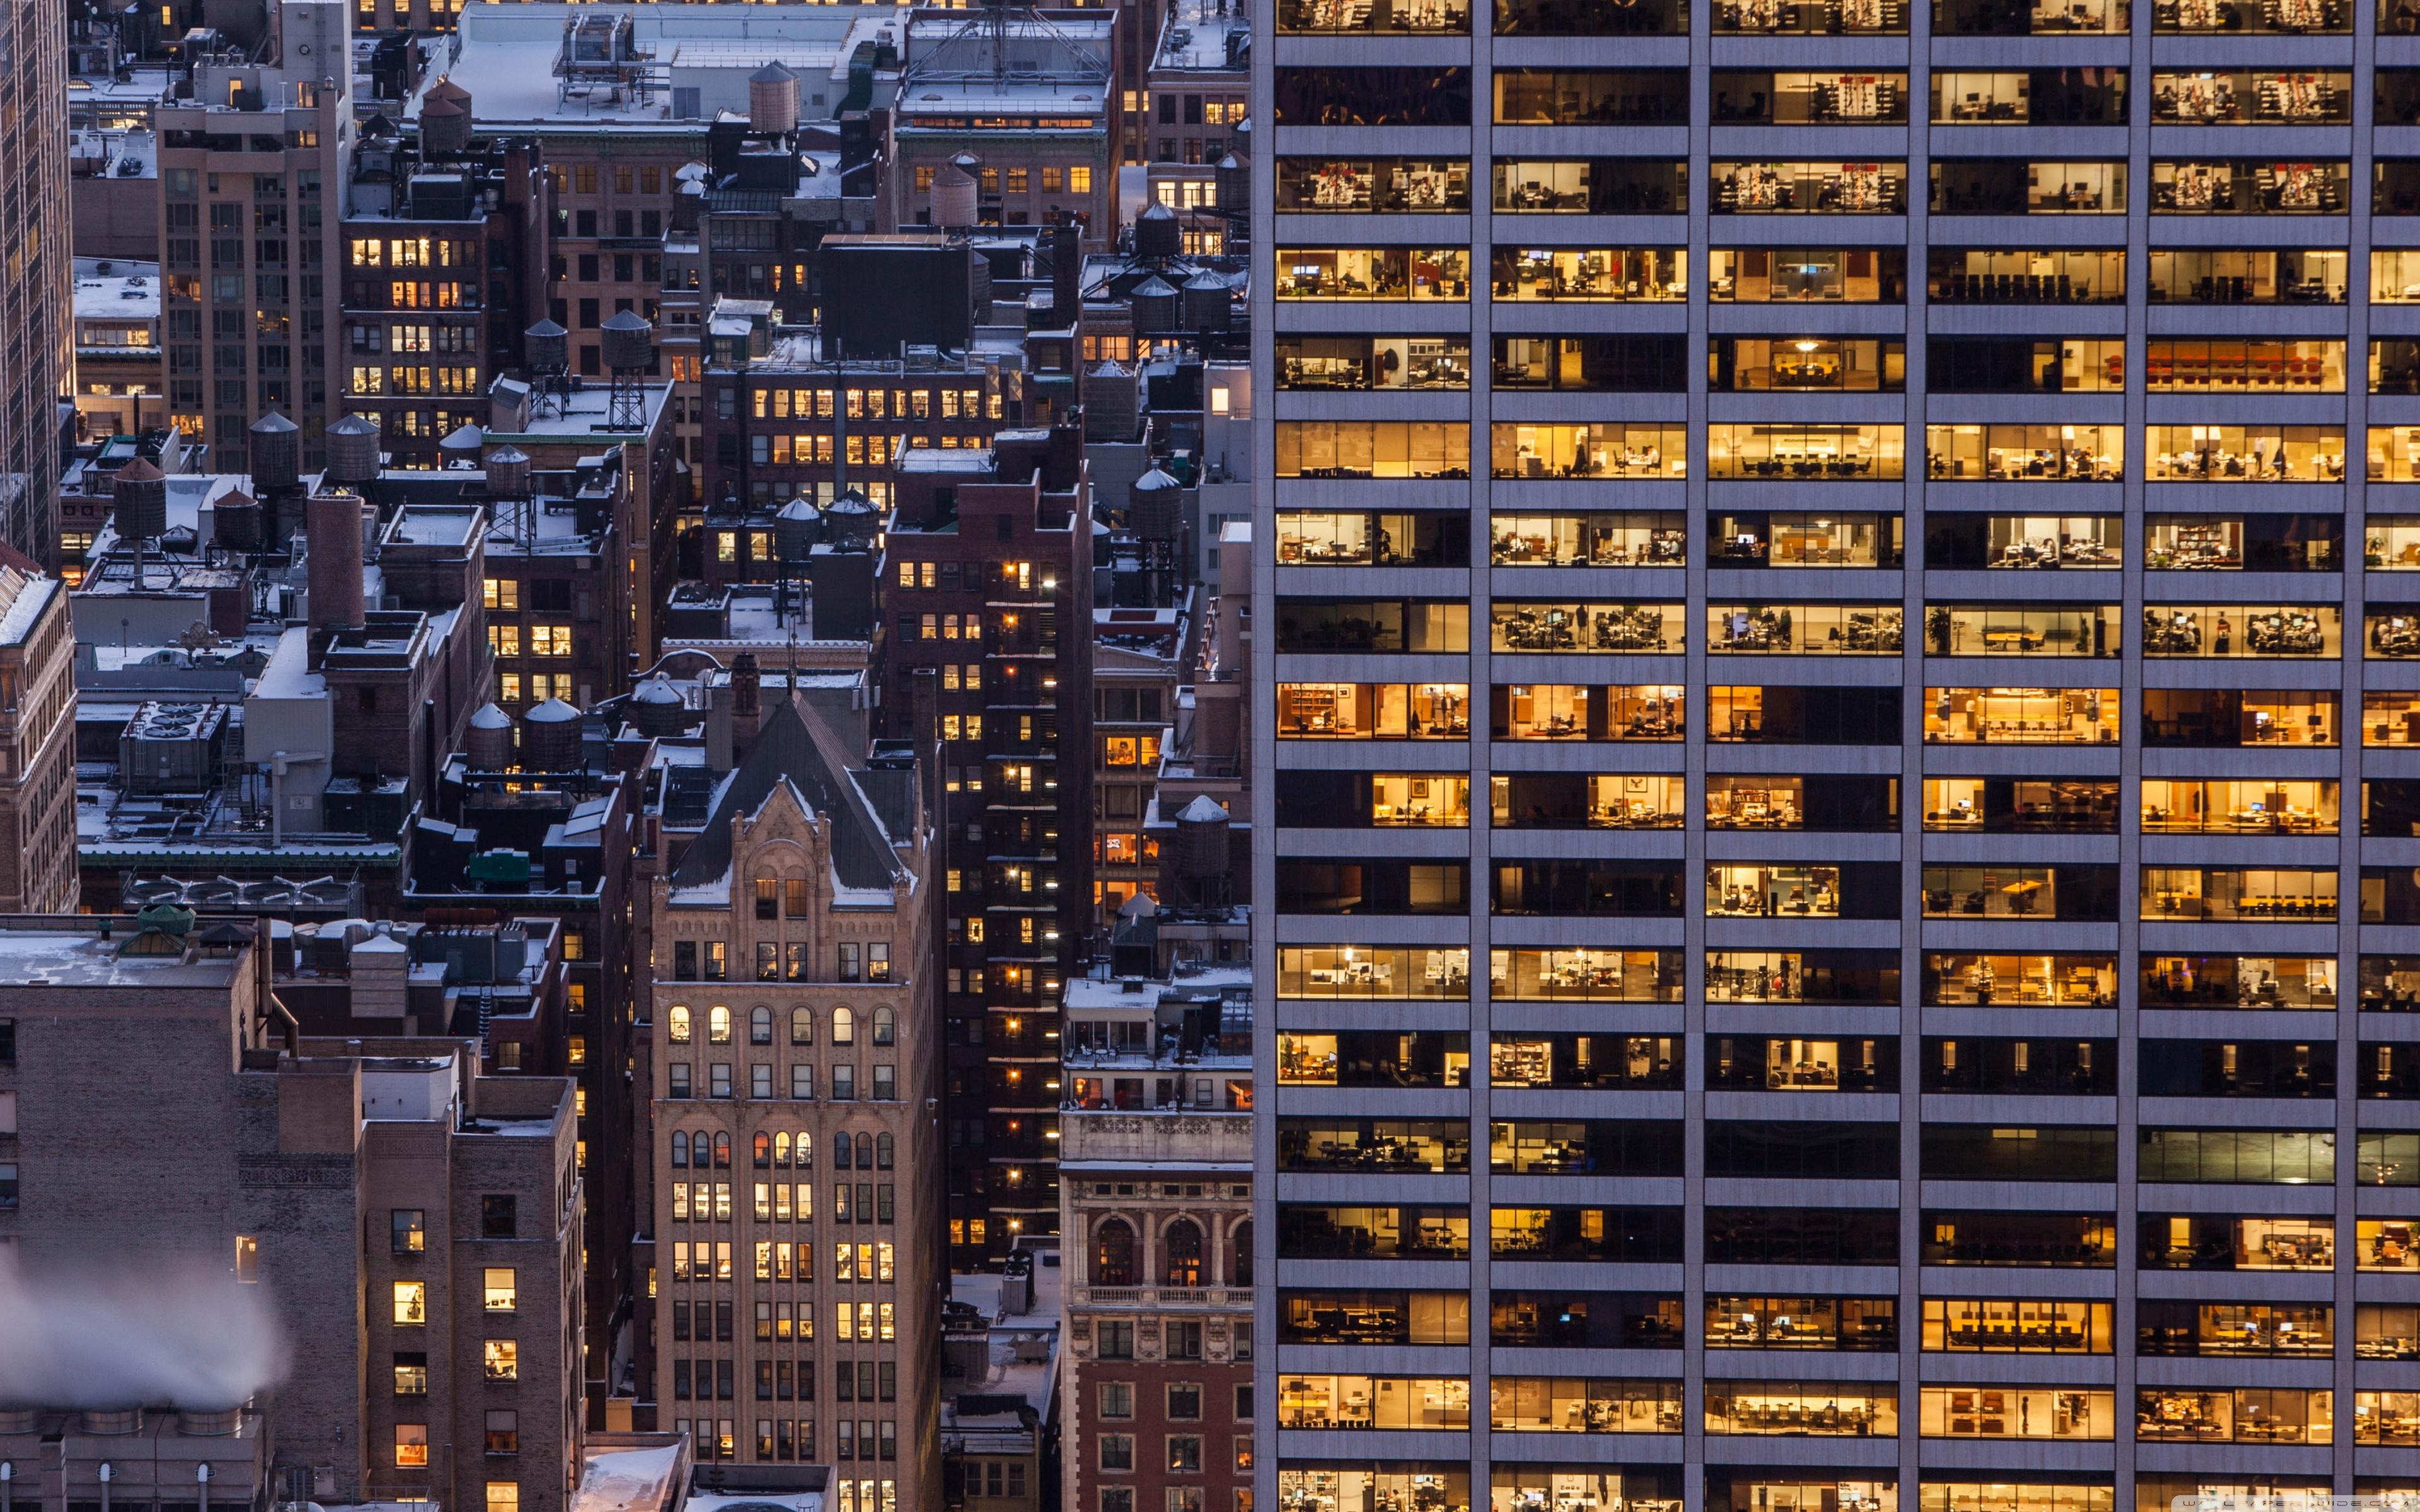 New York City Winter 4K HD Desktop Wallpaper for 4K Ultra HD TV 3840x2400